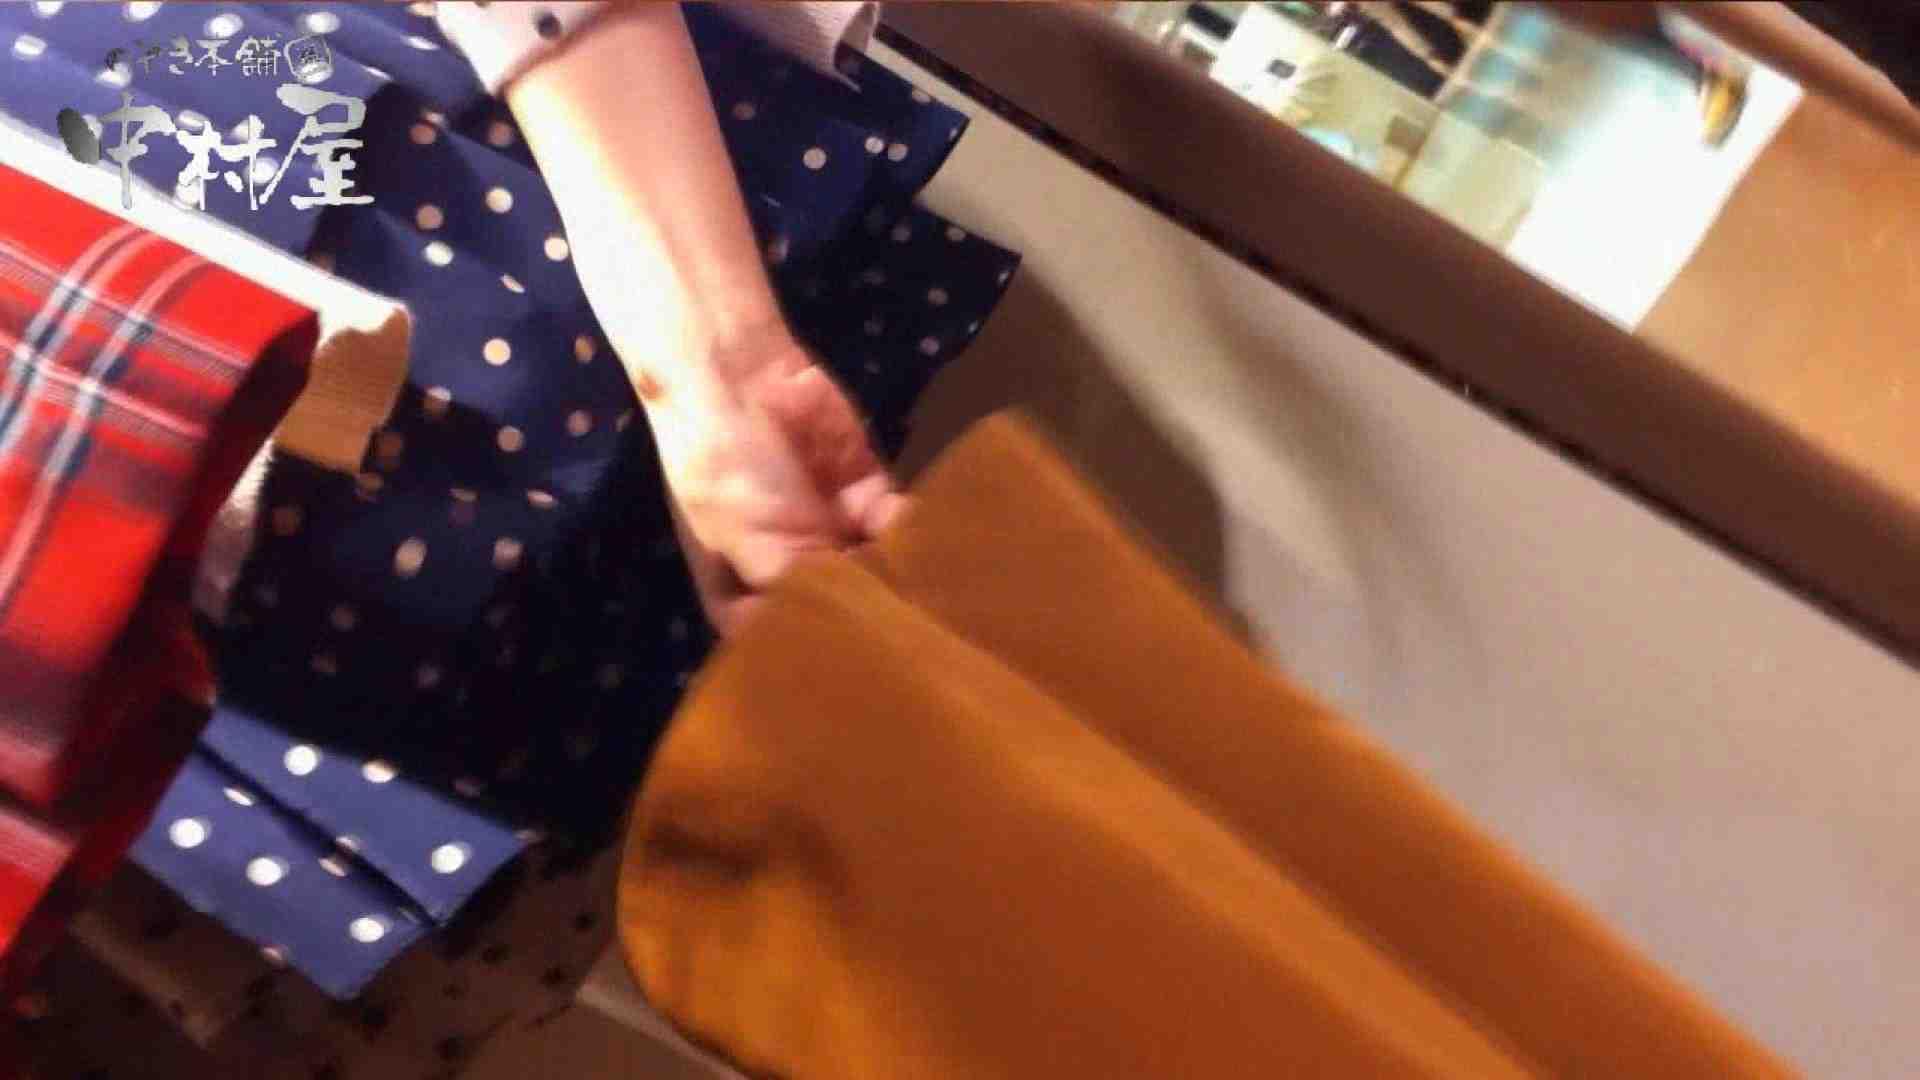 vol.57 美人アパレル胸チラ&パンチラ 激カワ店員のおっぱい チラ歓迎  99pic 72